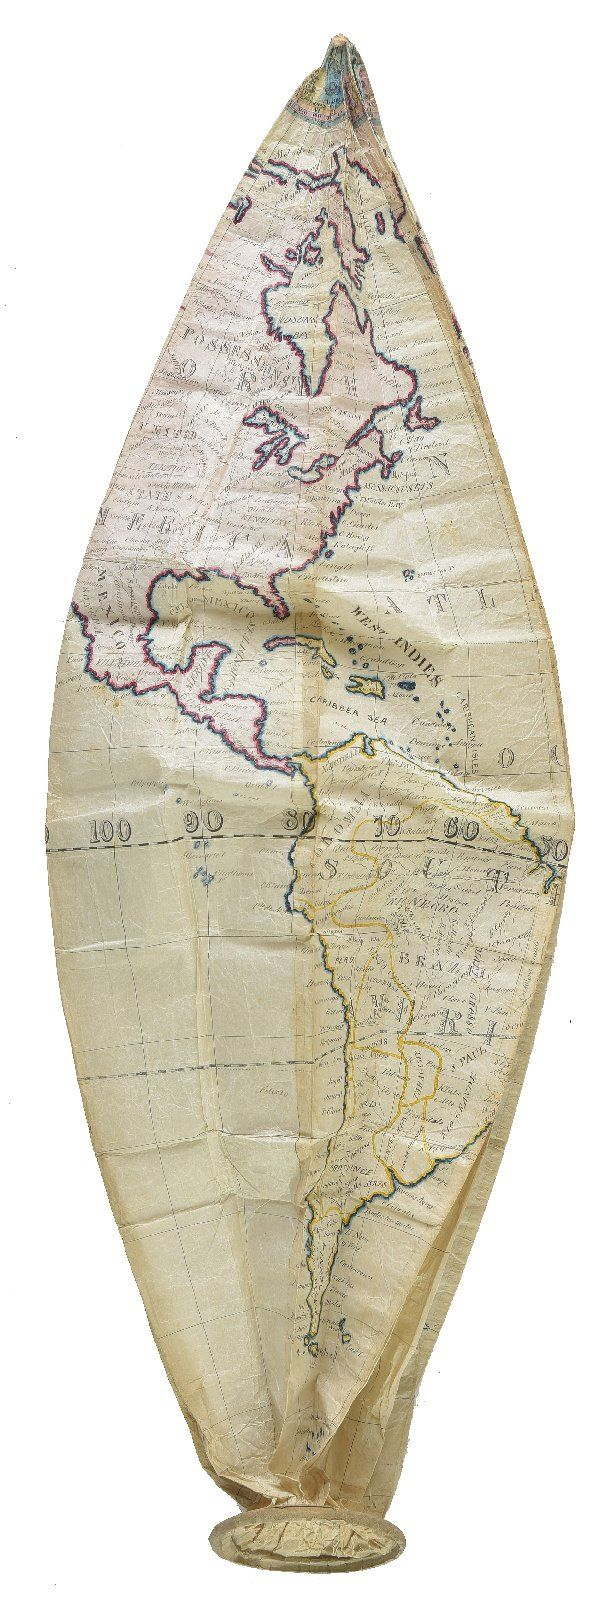 Globe To be had of GPocock patentee